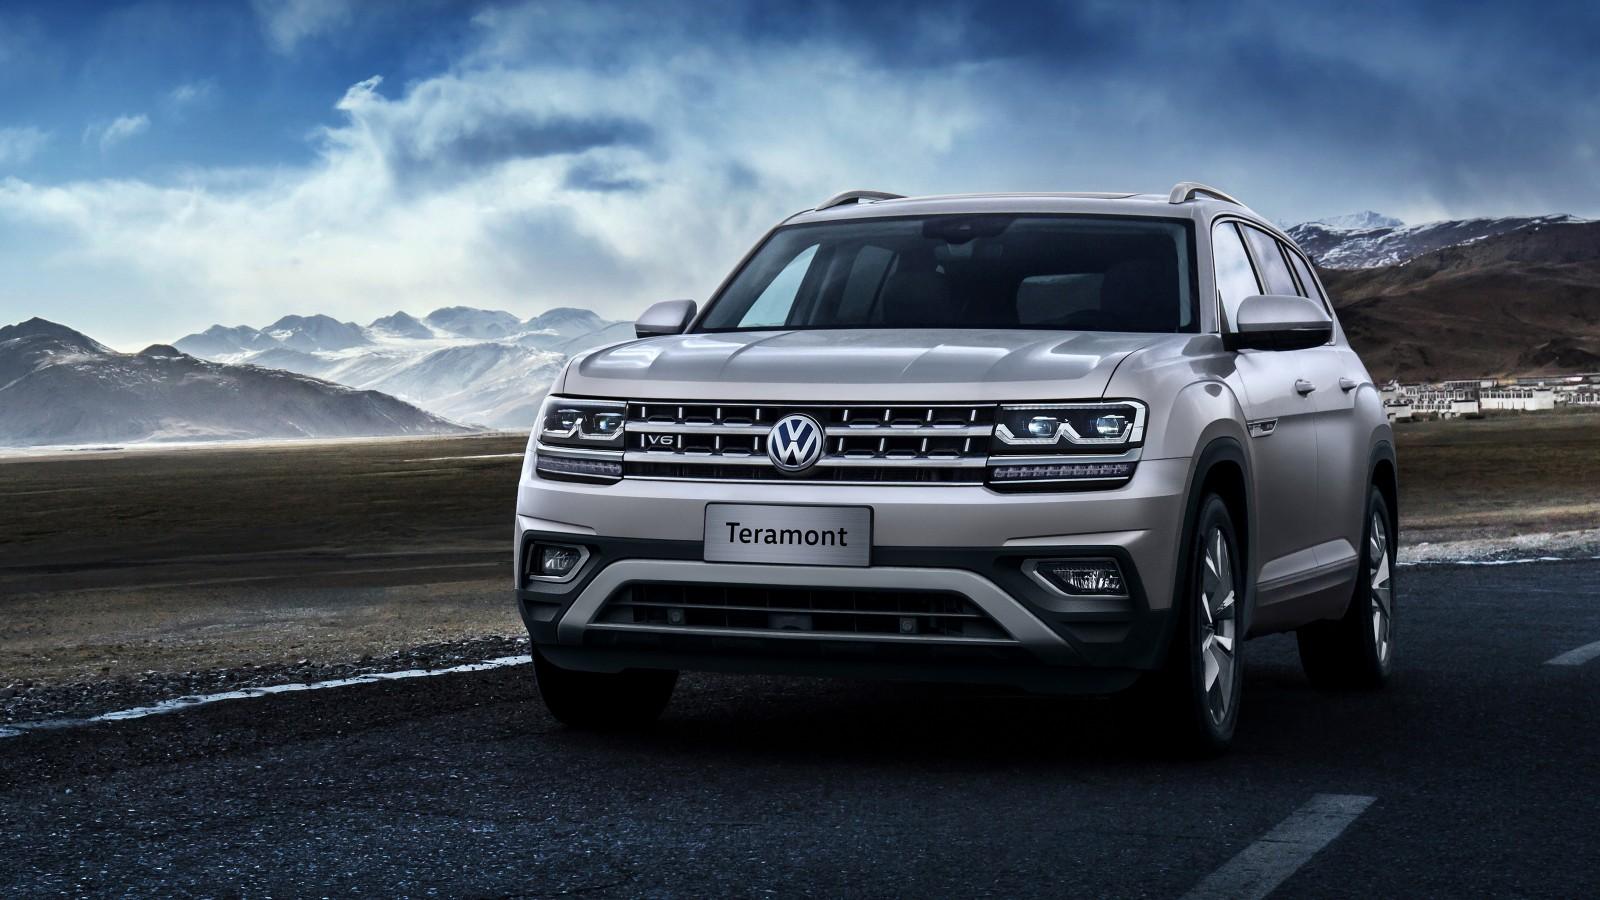 Hd Wallpaper 2019 Volkswagen Teramont Wallpaper Hd Car Wallpapers